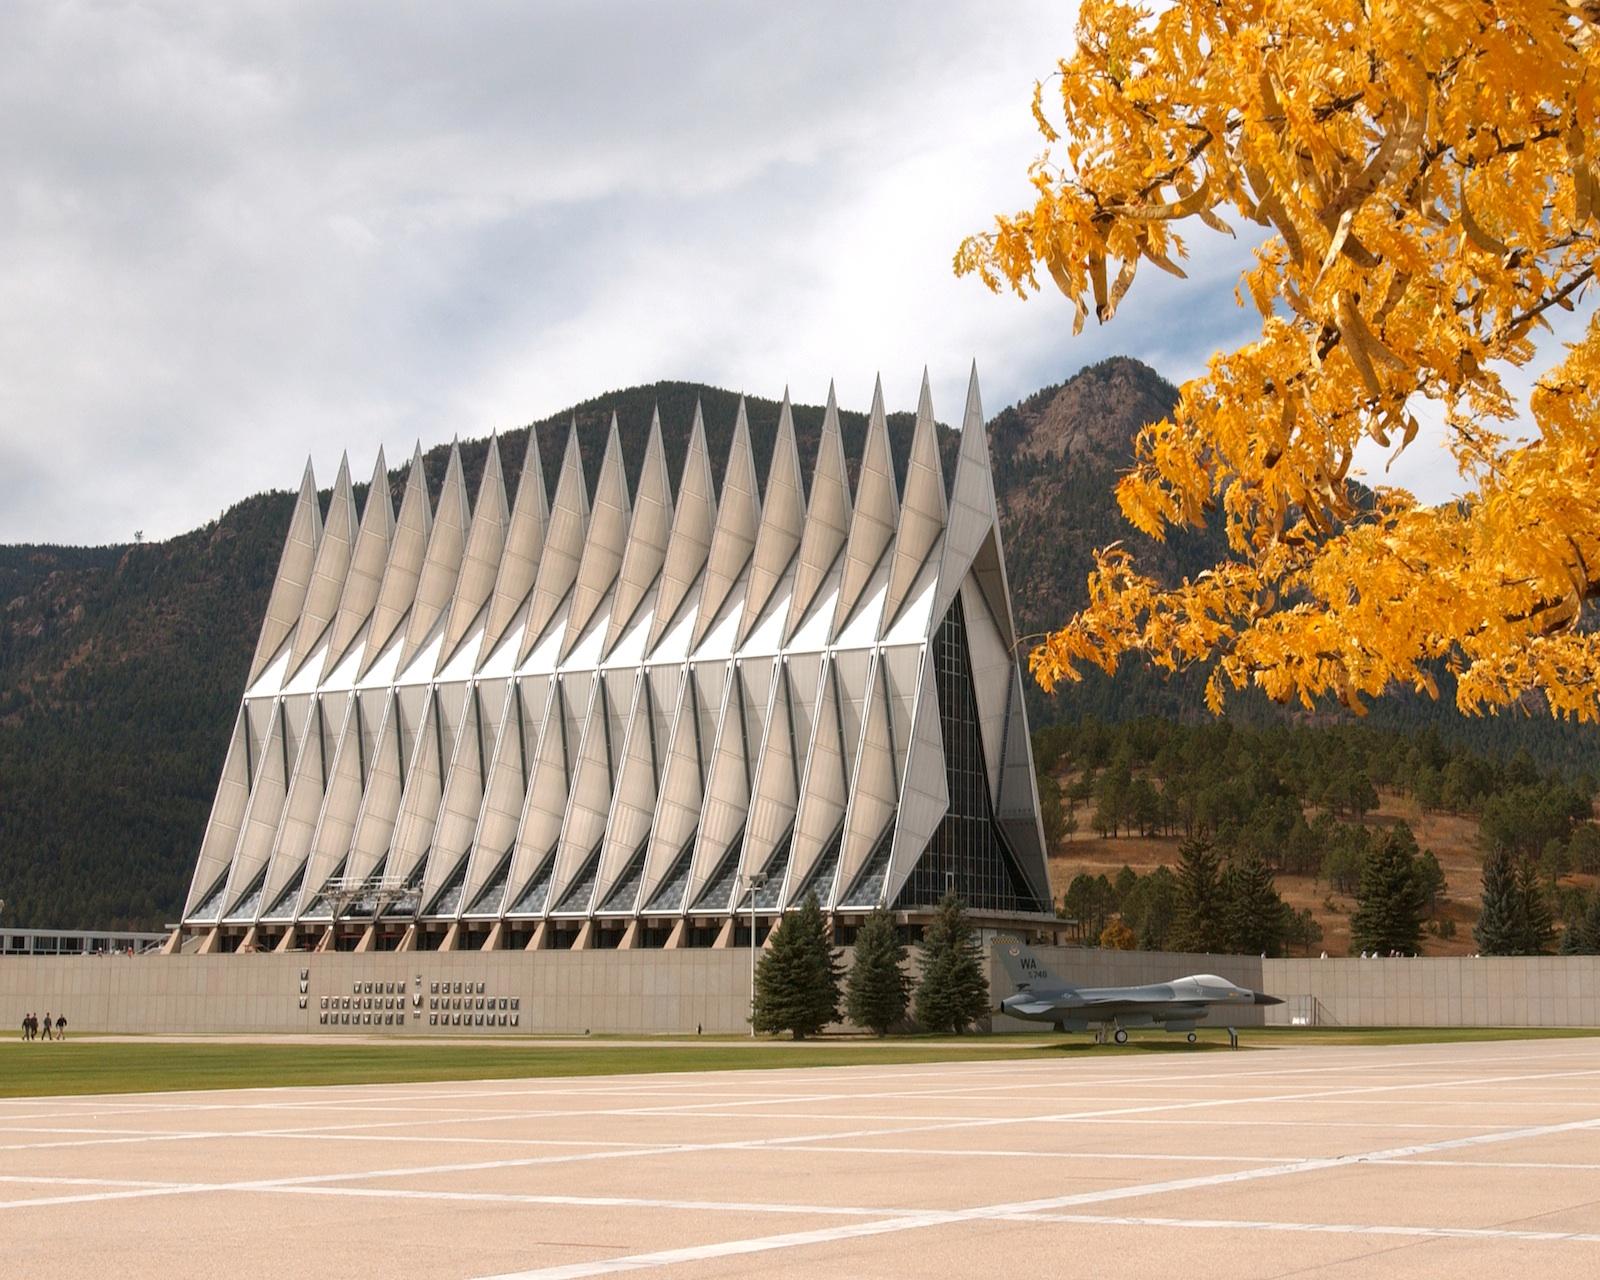 U. S. Airforce Chapel